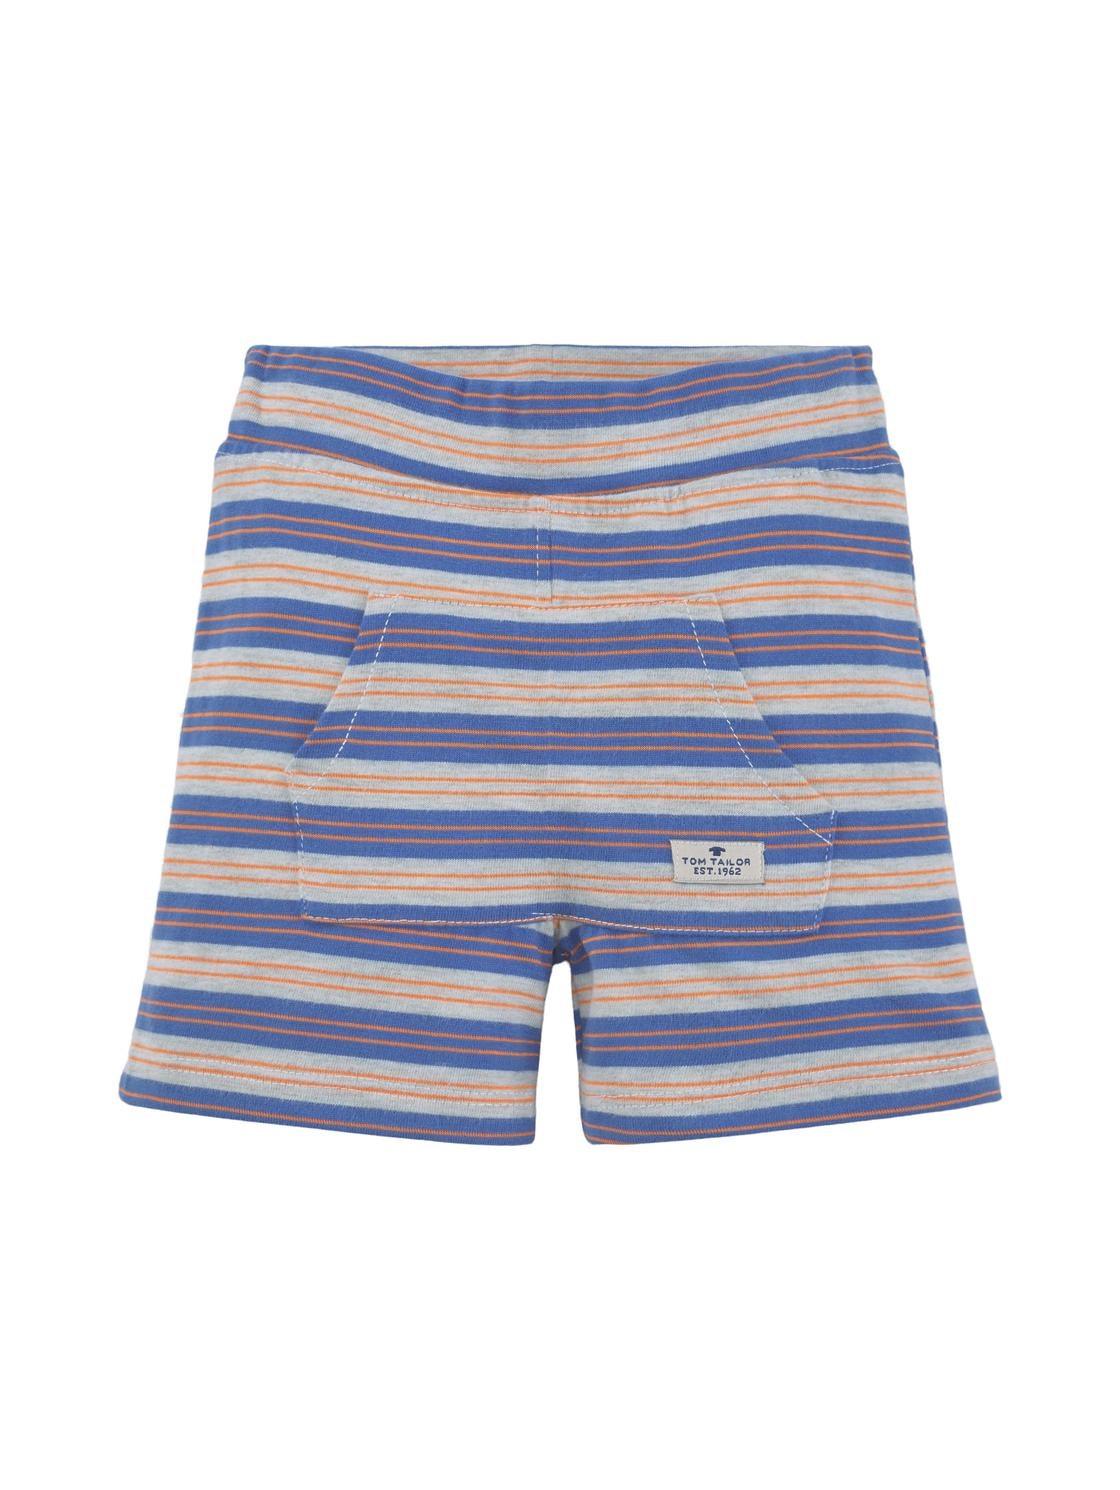 jersey shorts striped, y/d stripe-multicolored